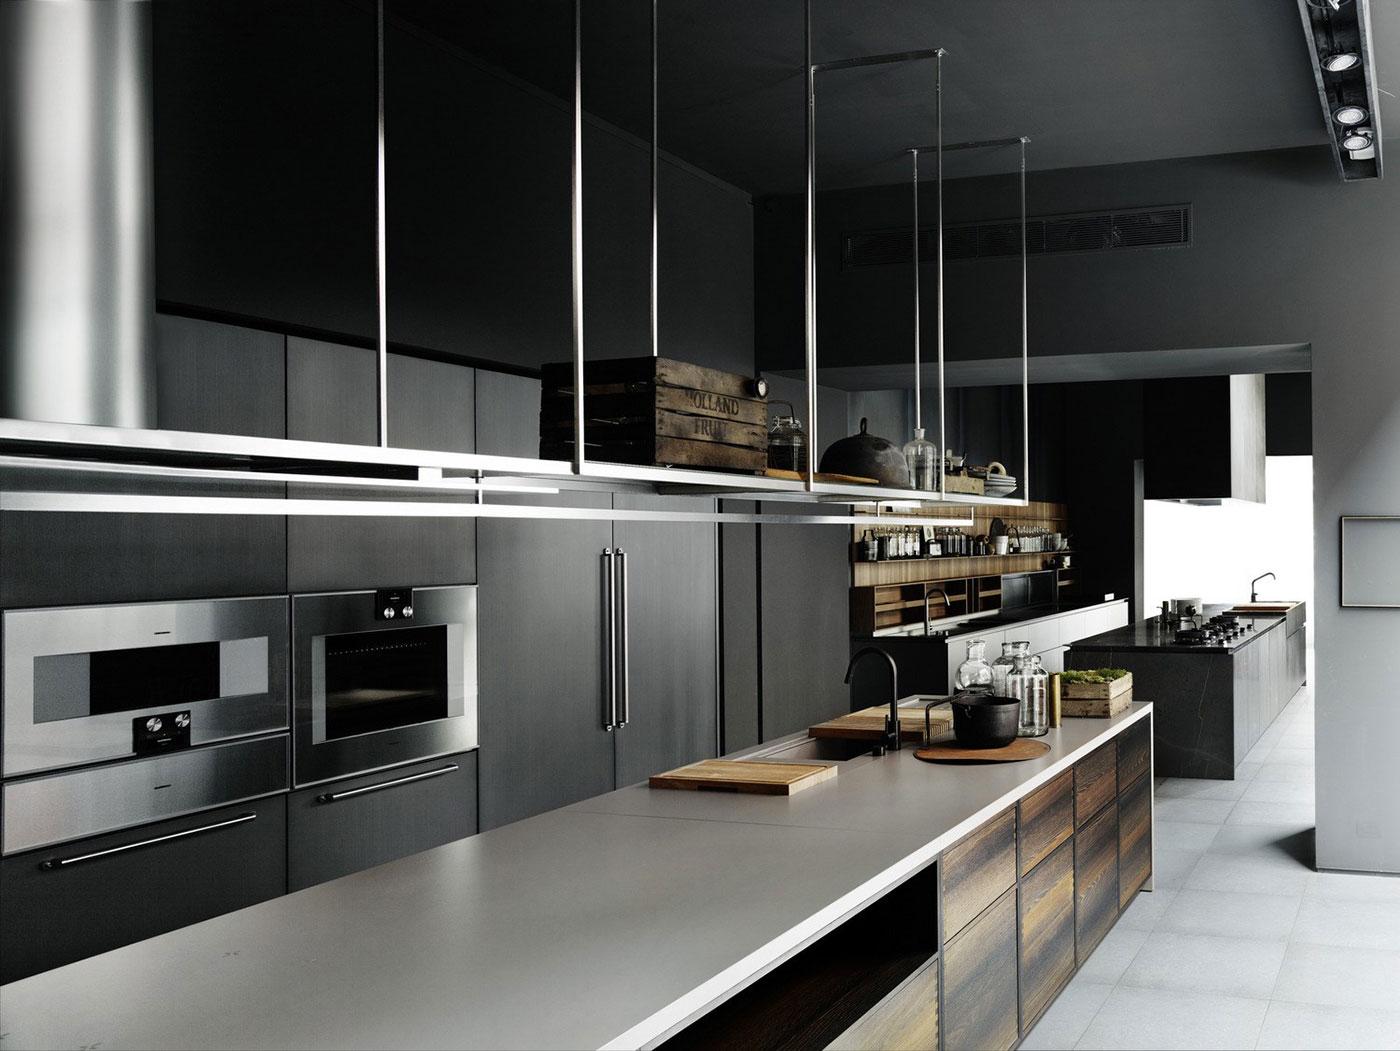 Obegi Home Boffi CODE Kitchen Boffi 254532 rel9daa428a